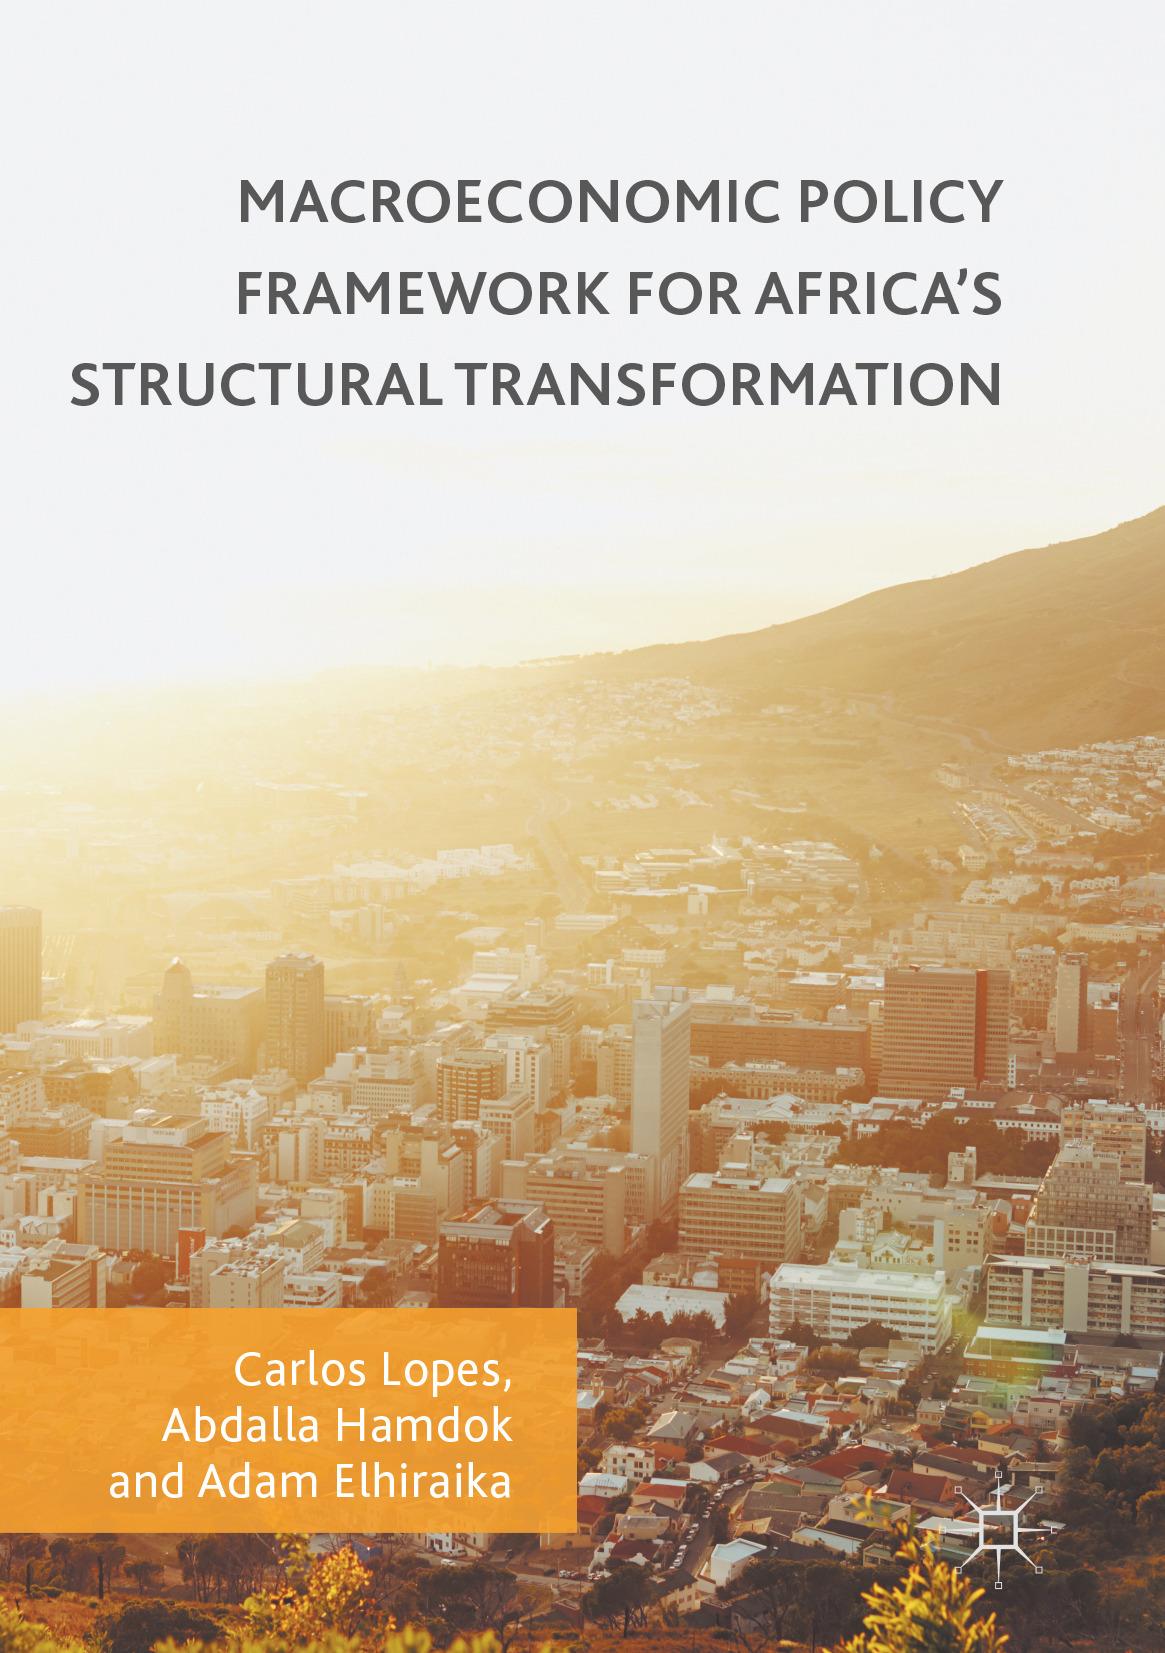 Elhiraika, Adam - Macroeconomic Policy Framework for Africa's Structural Transformation, ebook